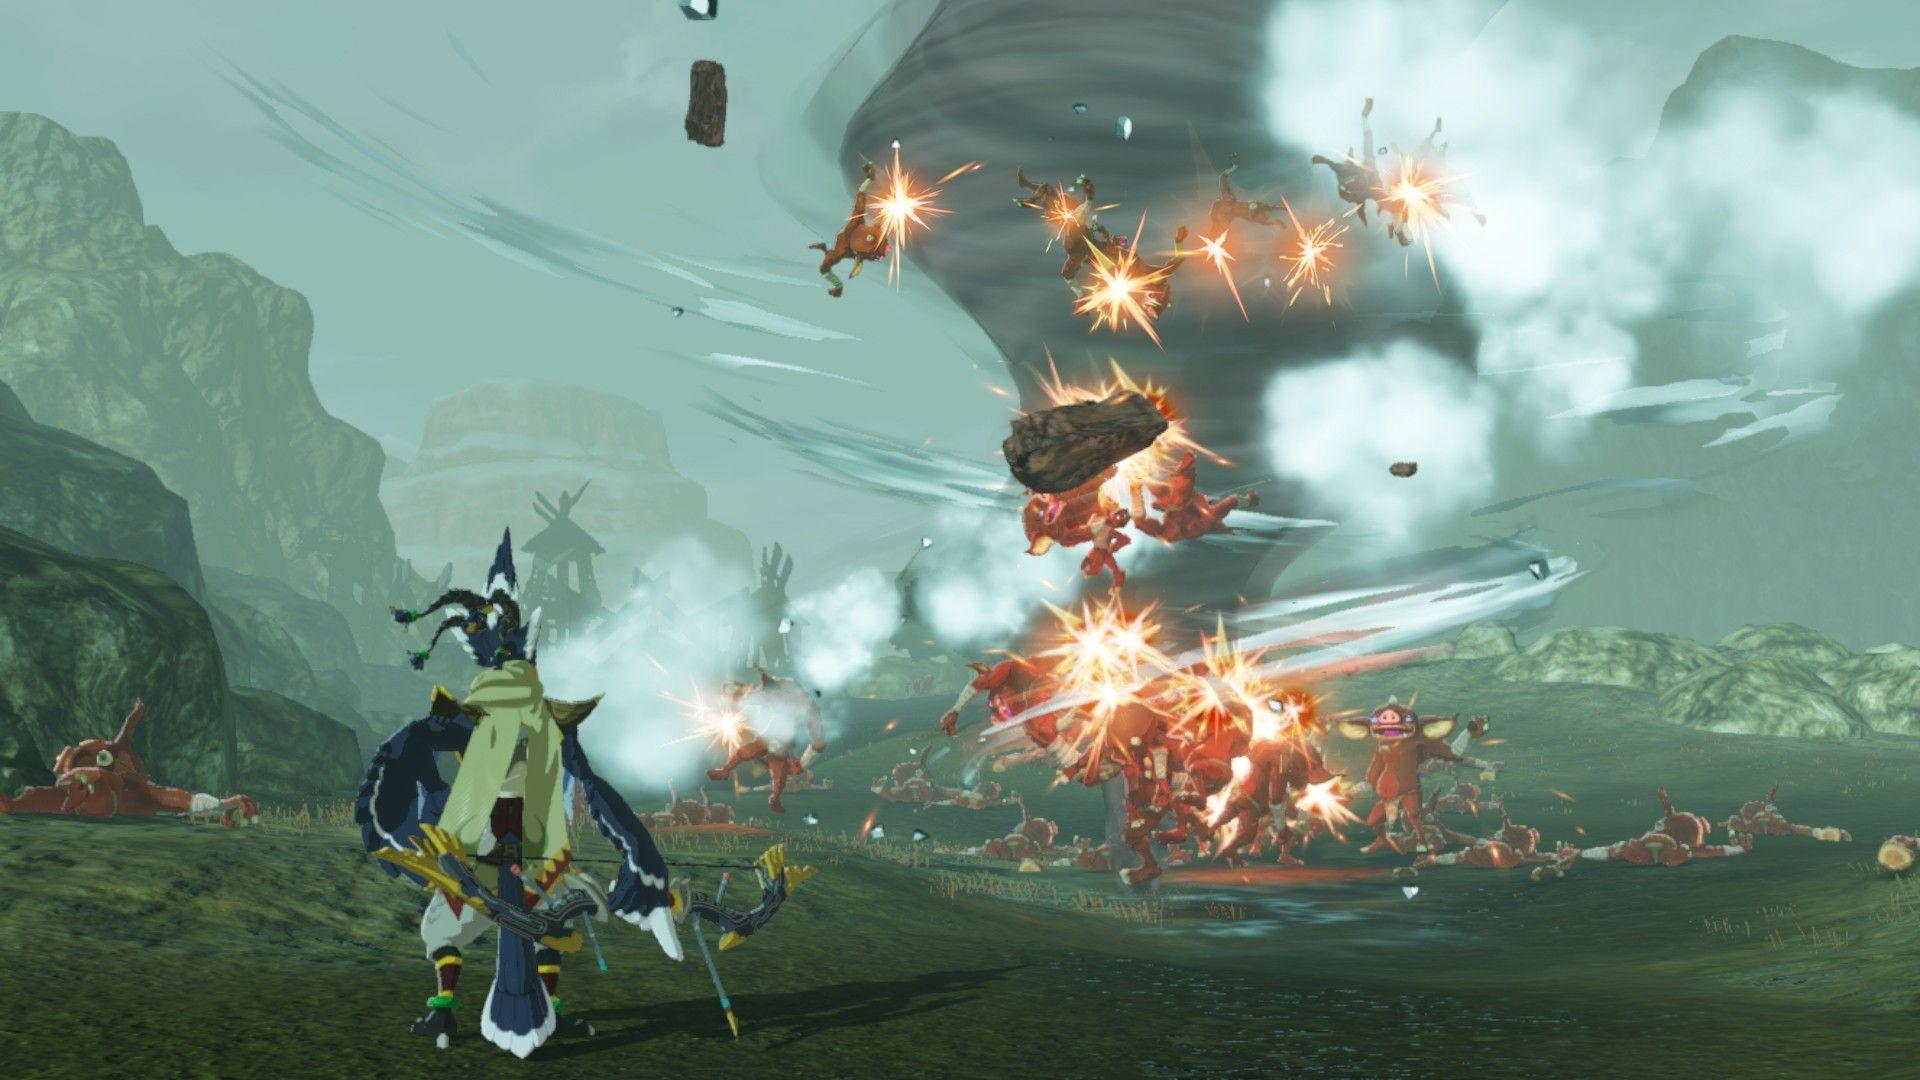 Н'𝐄𝐕𝐀𝐋𝐈 Age Of Calamity Hyrule Warriors Legend Of Zelda Headlines Today